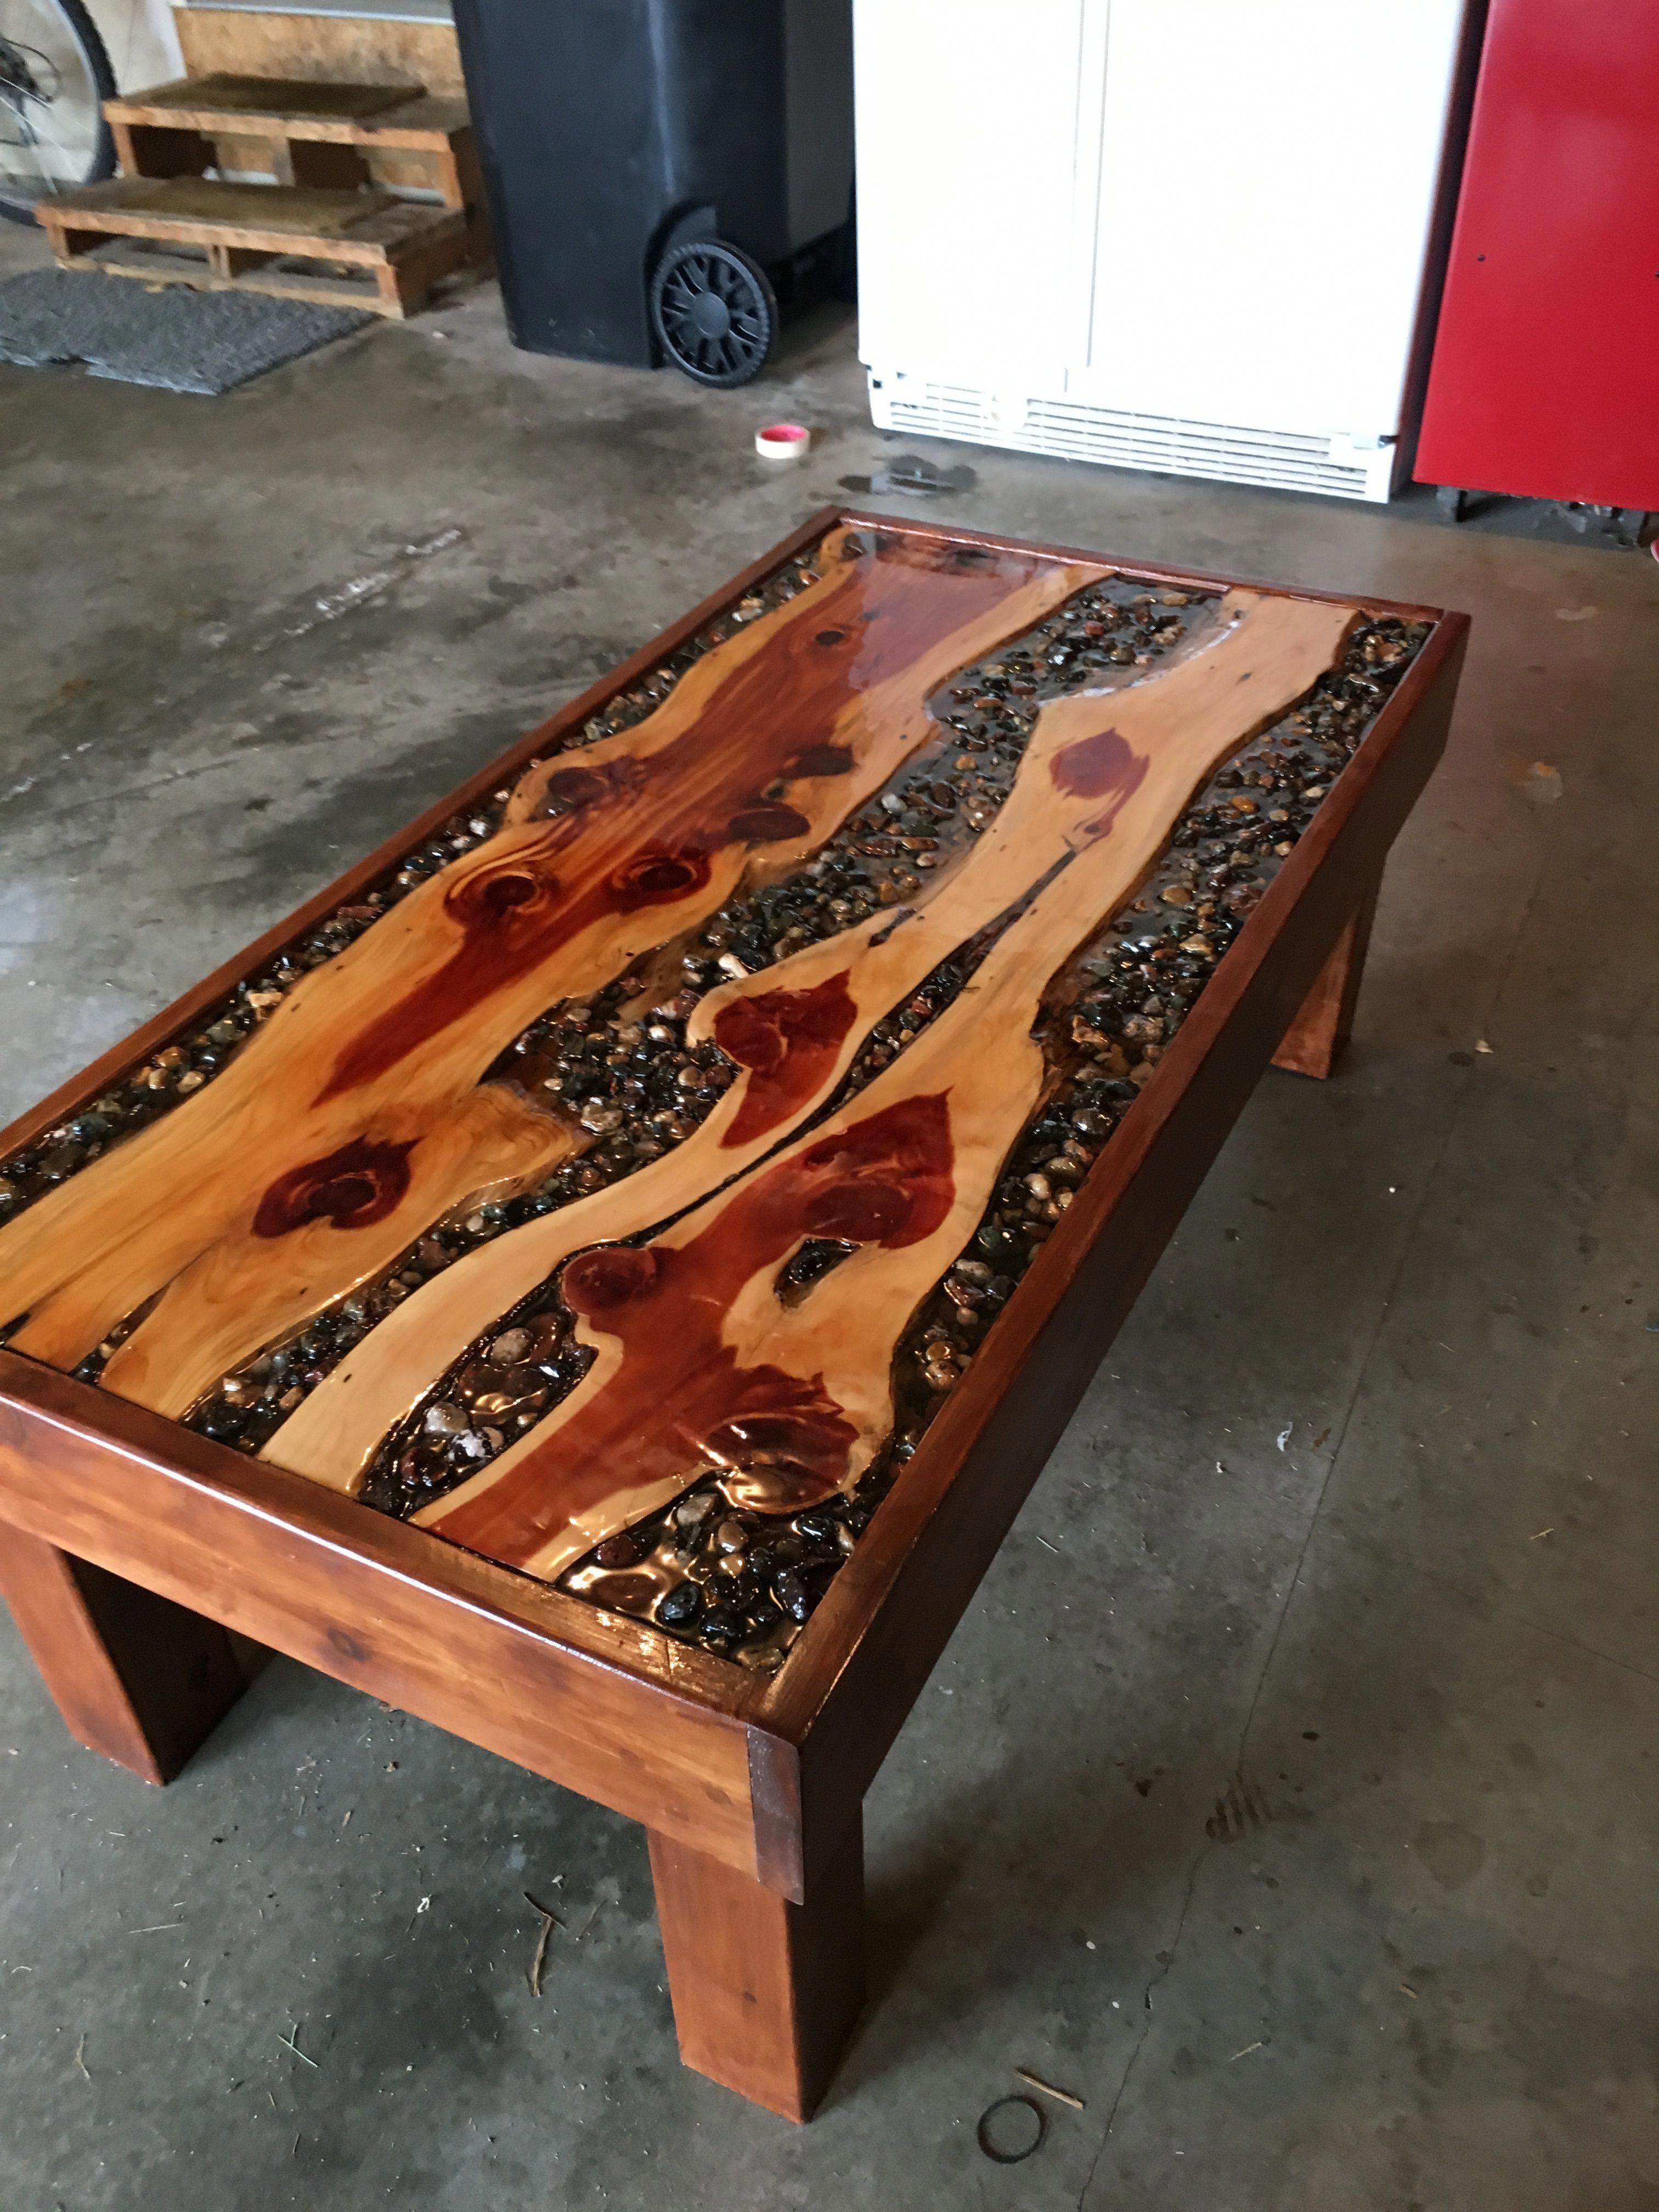 Custom Cedar Wood Coffee Table With River Rocks And Epoxy Diyresinwoodtables Cedar Wood Projects Wood Resin Table Coffee Table Wood [ 4032 x 3024 Pixel ]